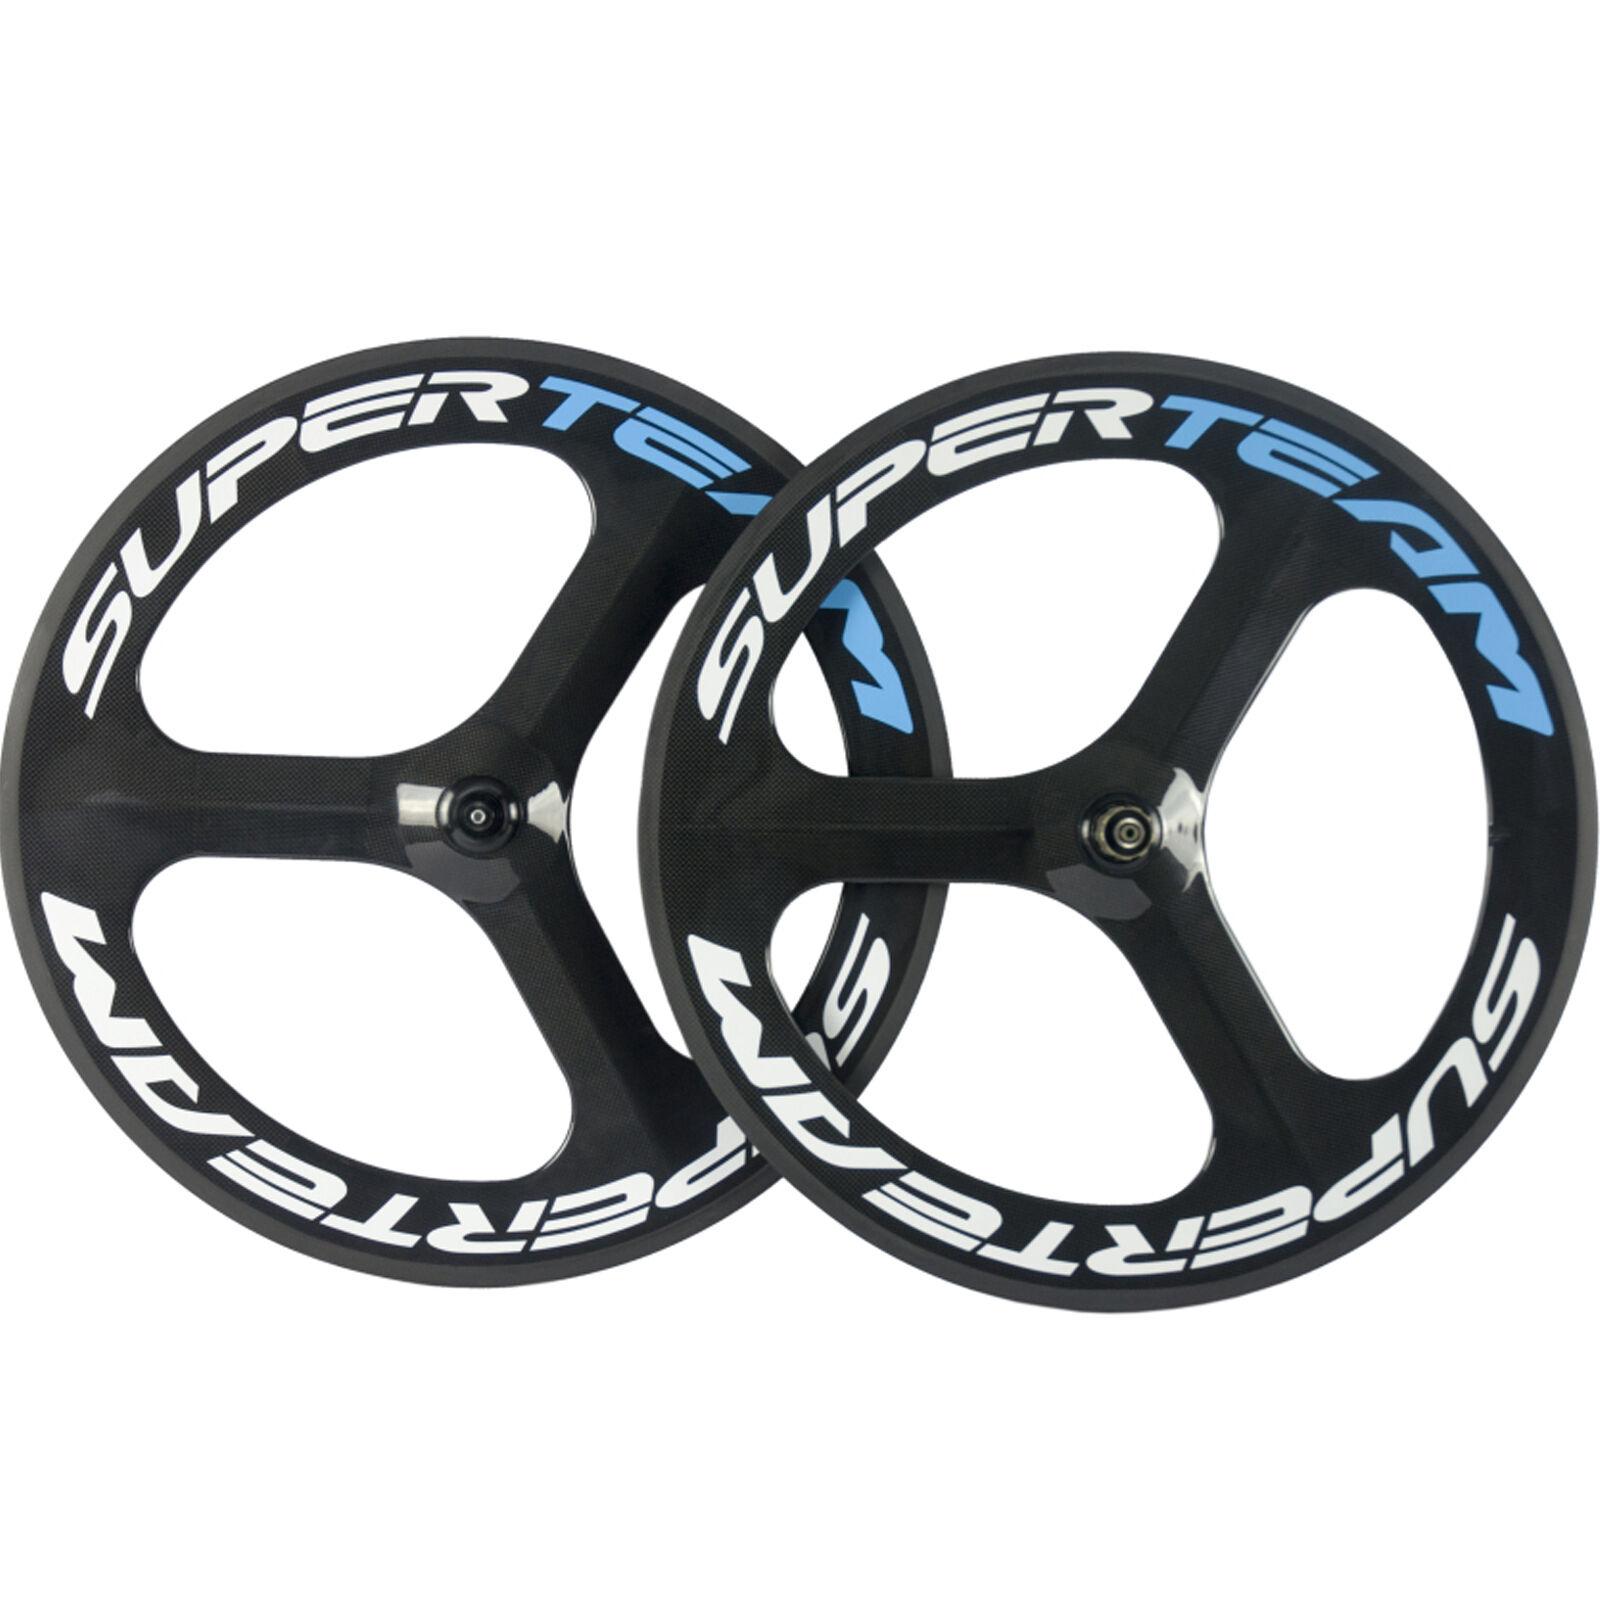 SUPERTEAM 70mm 3 Spoke Wheel Carbon Road Bike Clincher Wheelset Tri Spoke Glossy